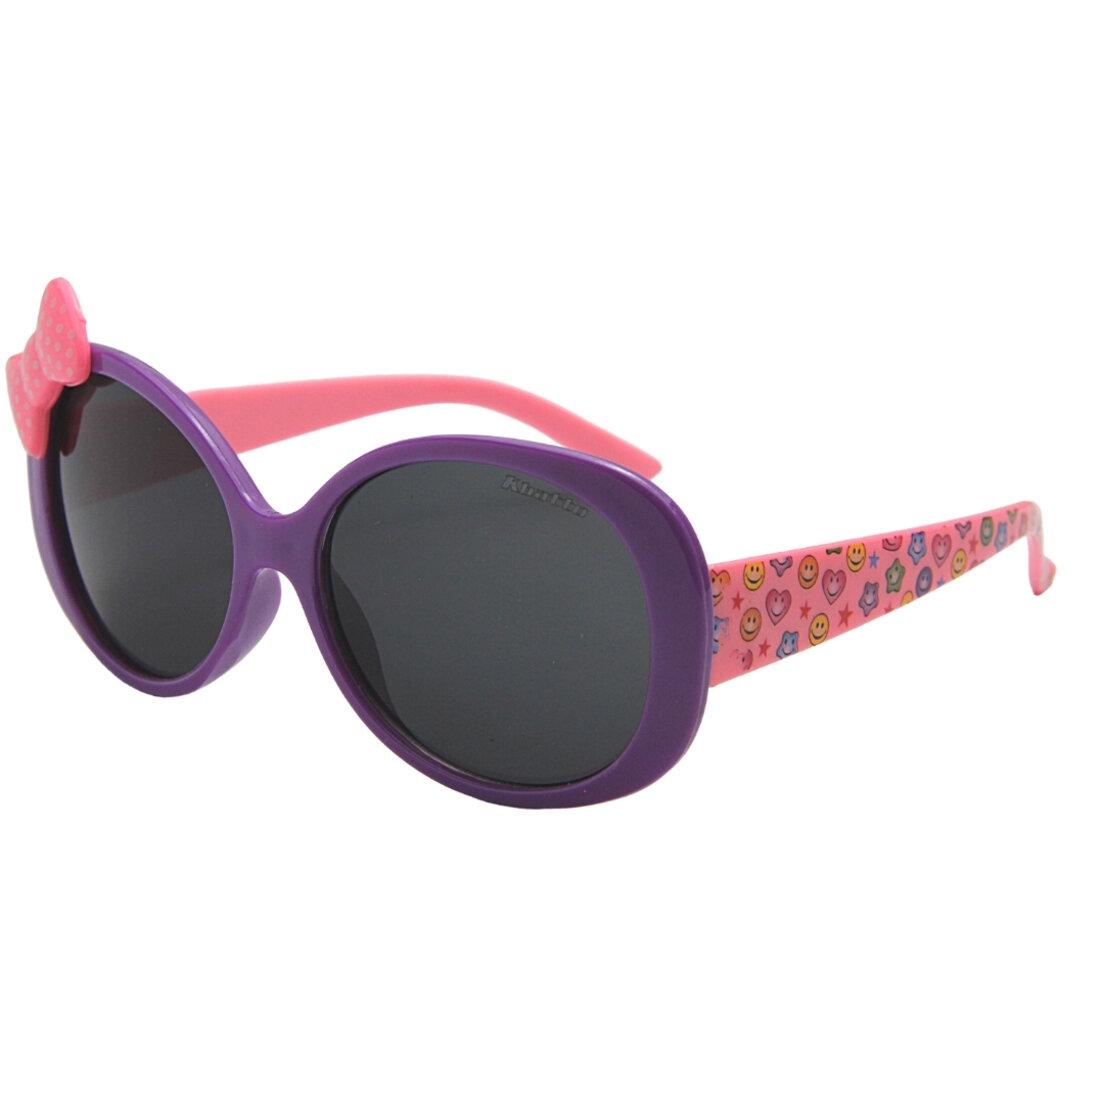 Óculos de Sol Khatto Kids Retrô Lacinho - C101